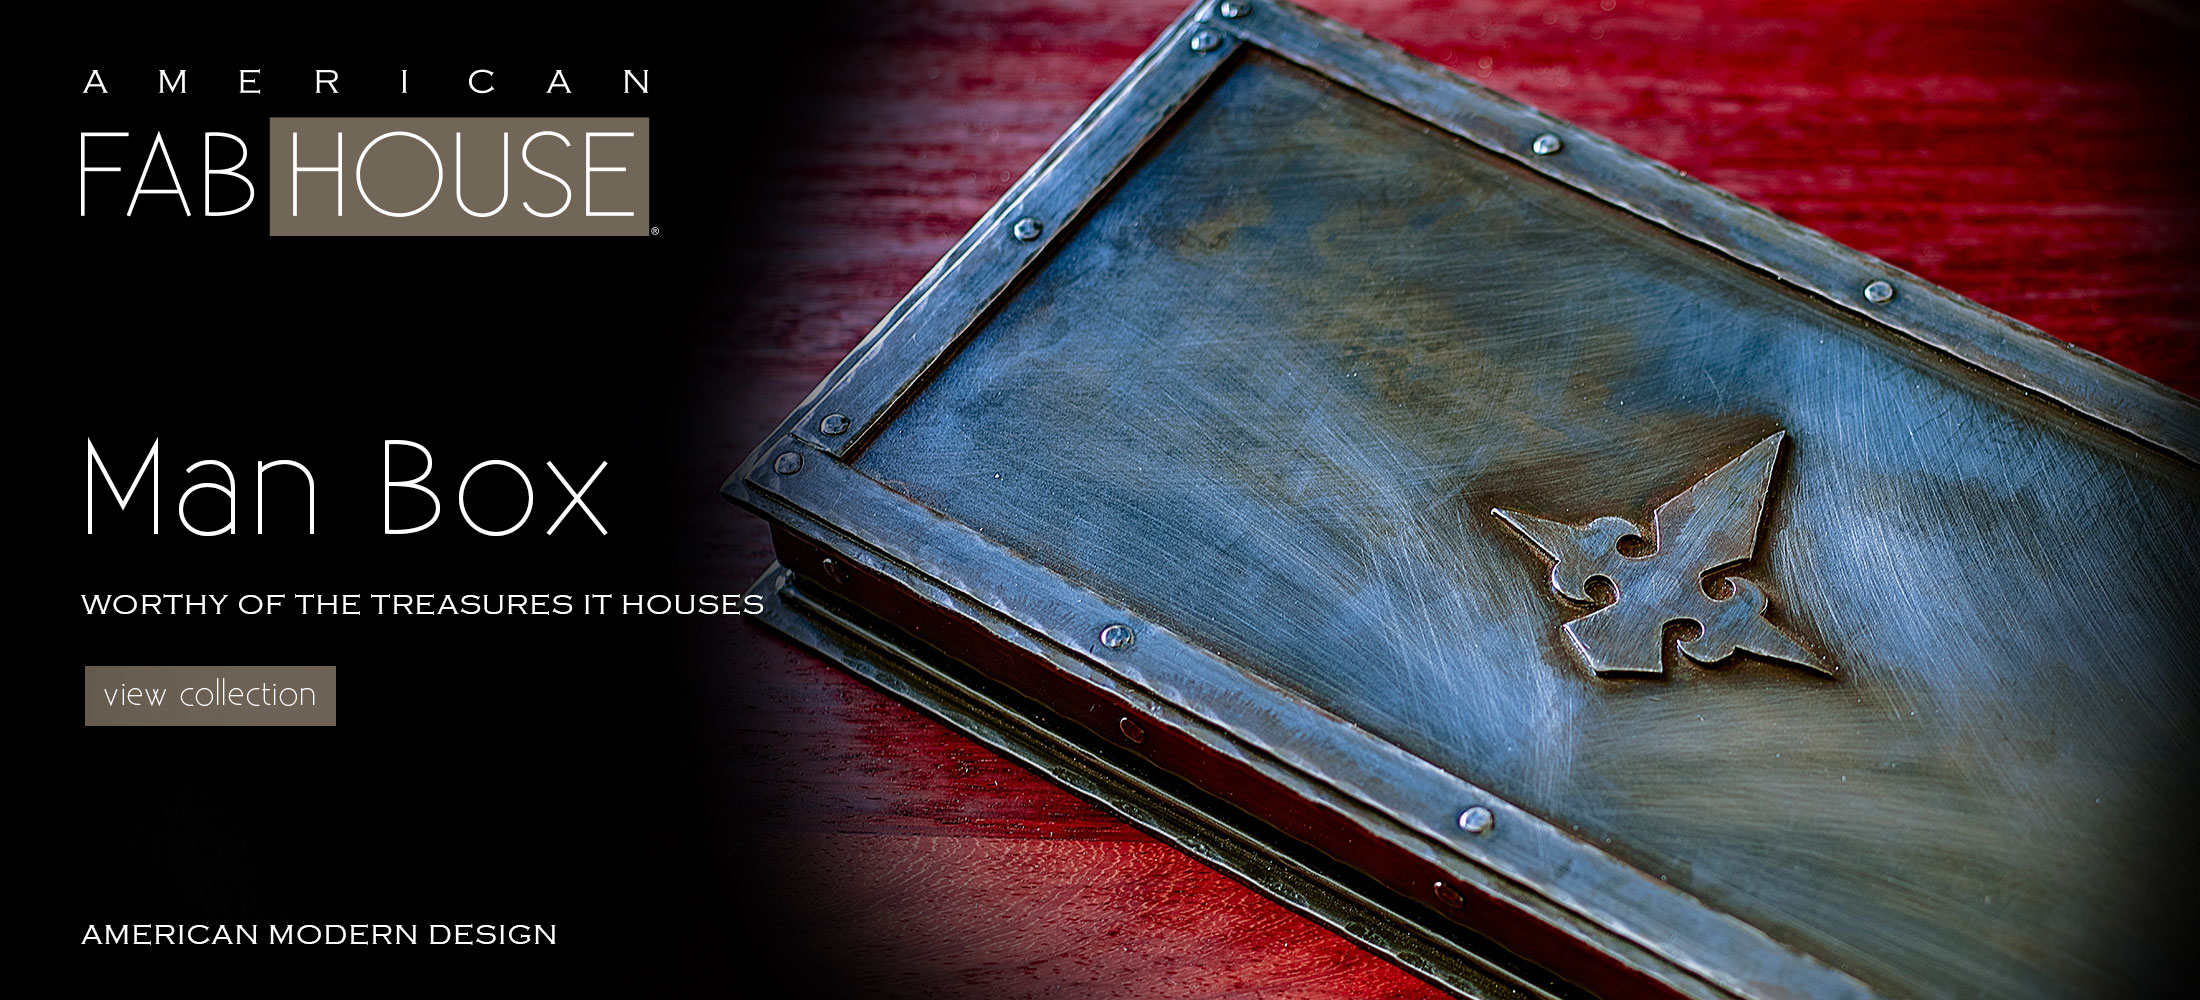 man box home decor american fabhouse